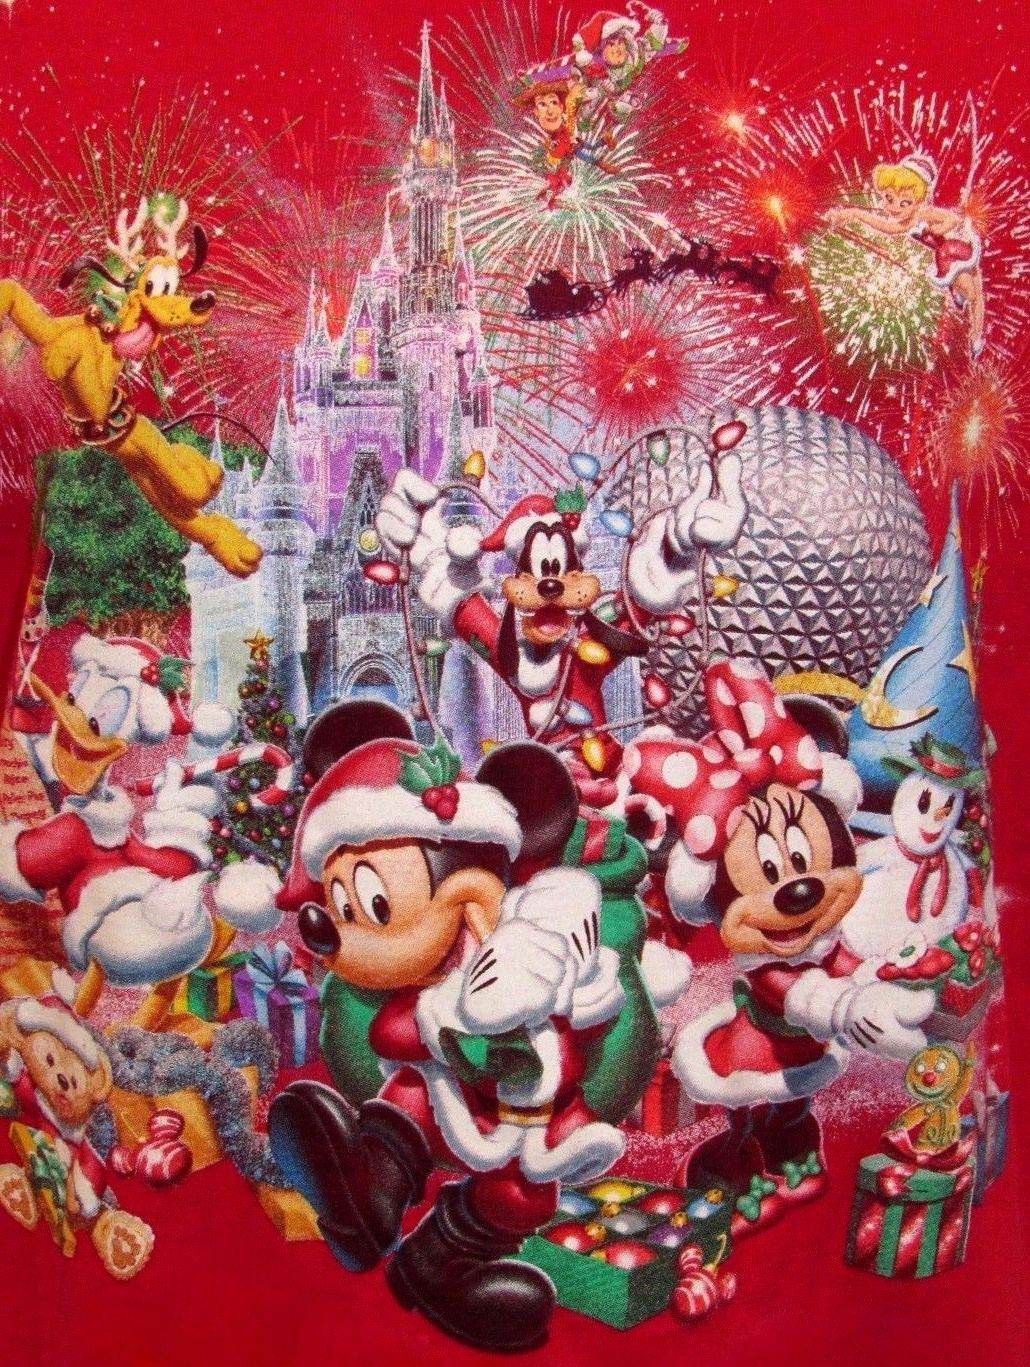 Happy Holidays Mickey Christmas Disney Merry Christmas Disney